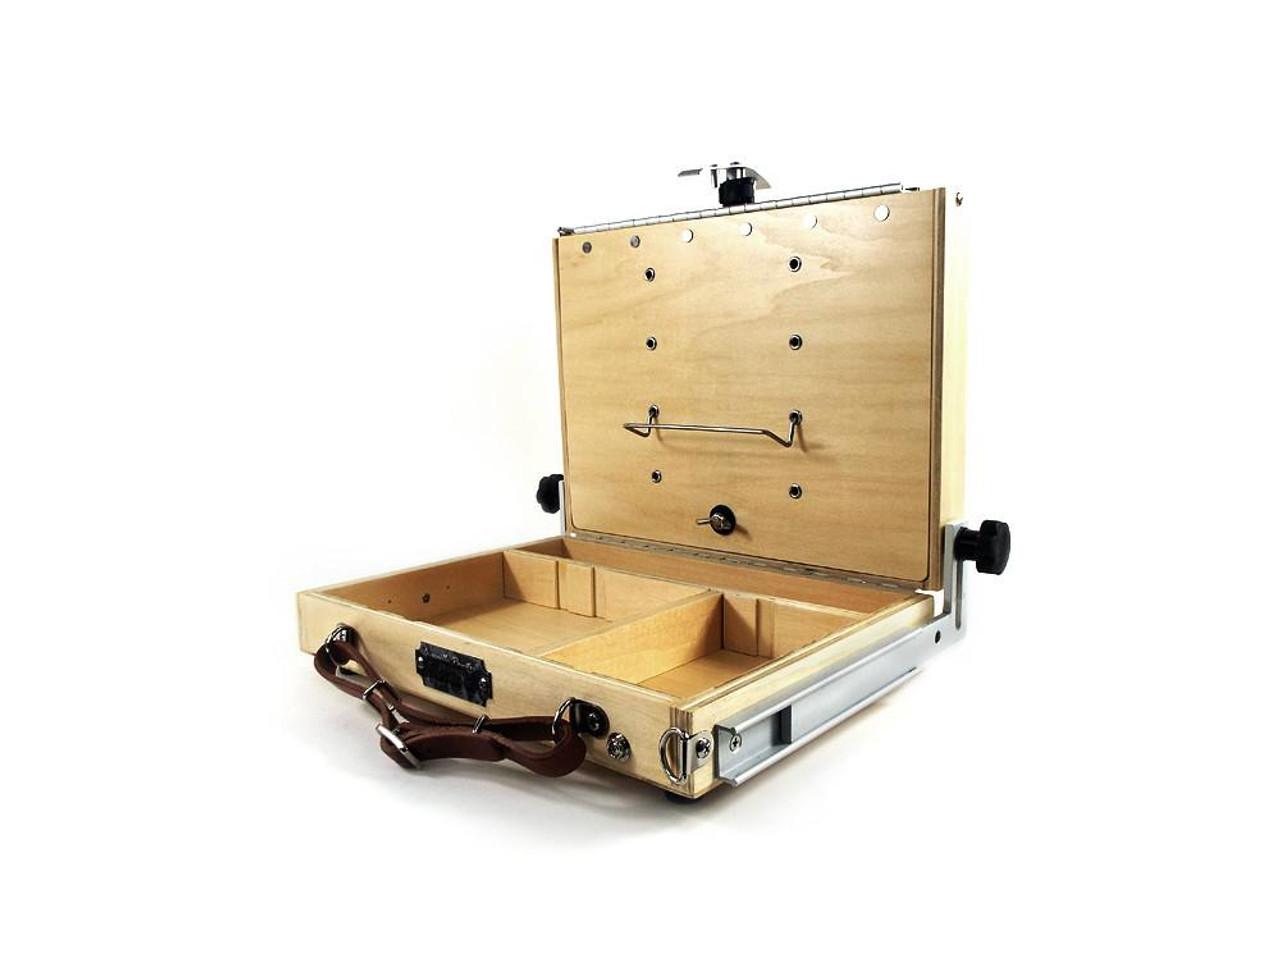 French Resistance Box Medium